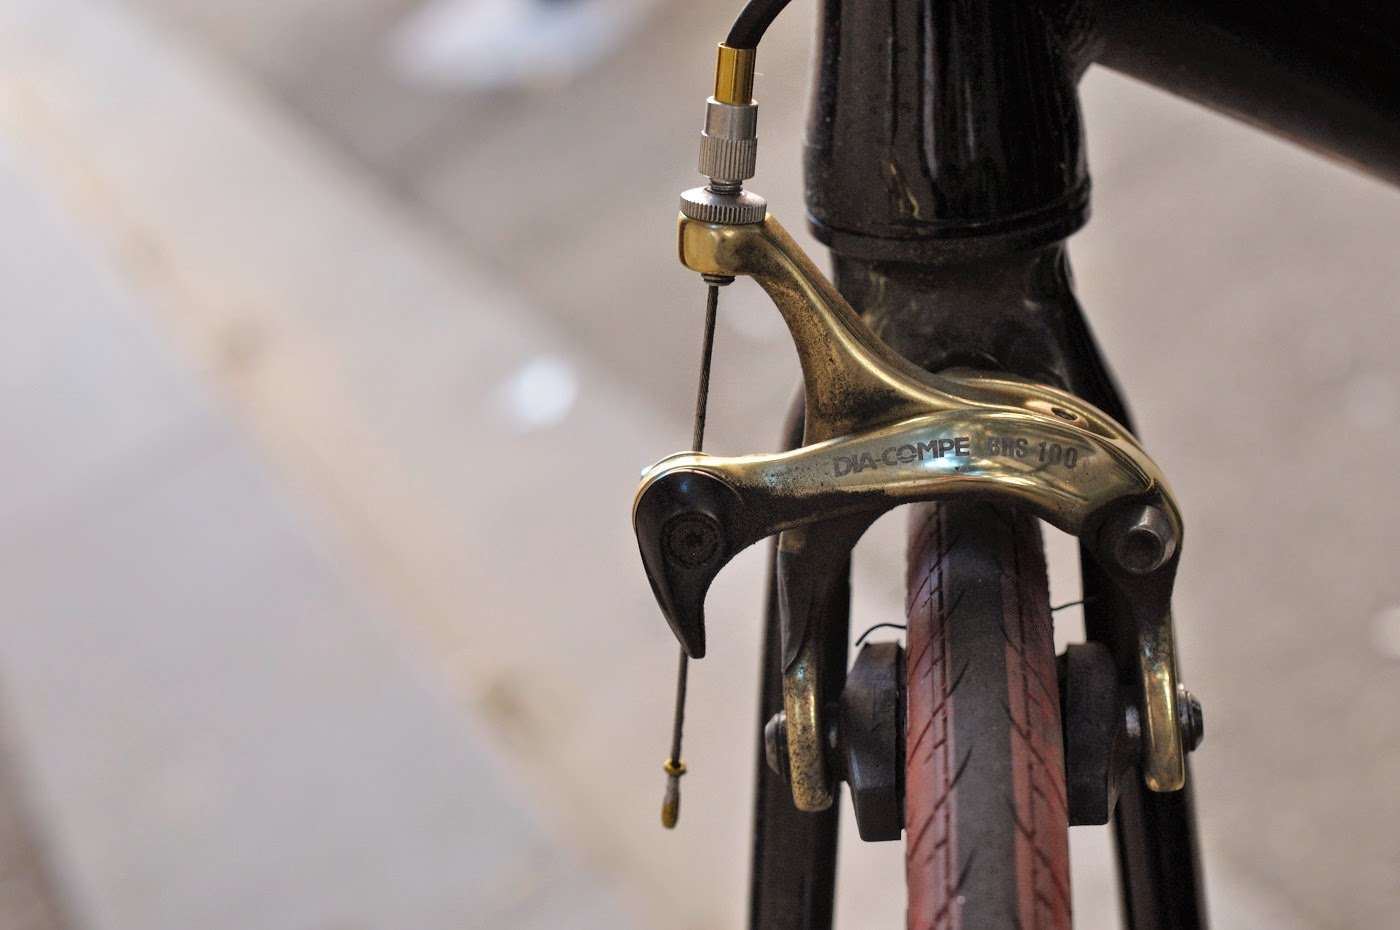 diacomple, front brake, The Biketorialist, tim Macauley, the light monkey collective, cycle deal dot com, track frame, bicycle, bike, bespoke, custom, customisation, black, Melbourne, Australia